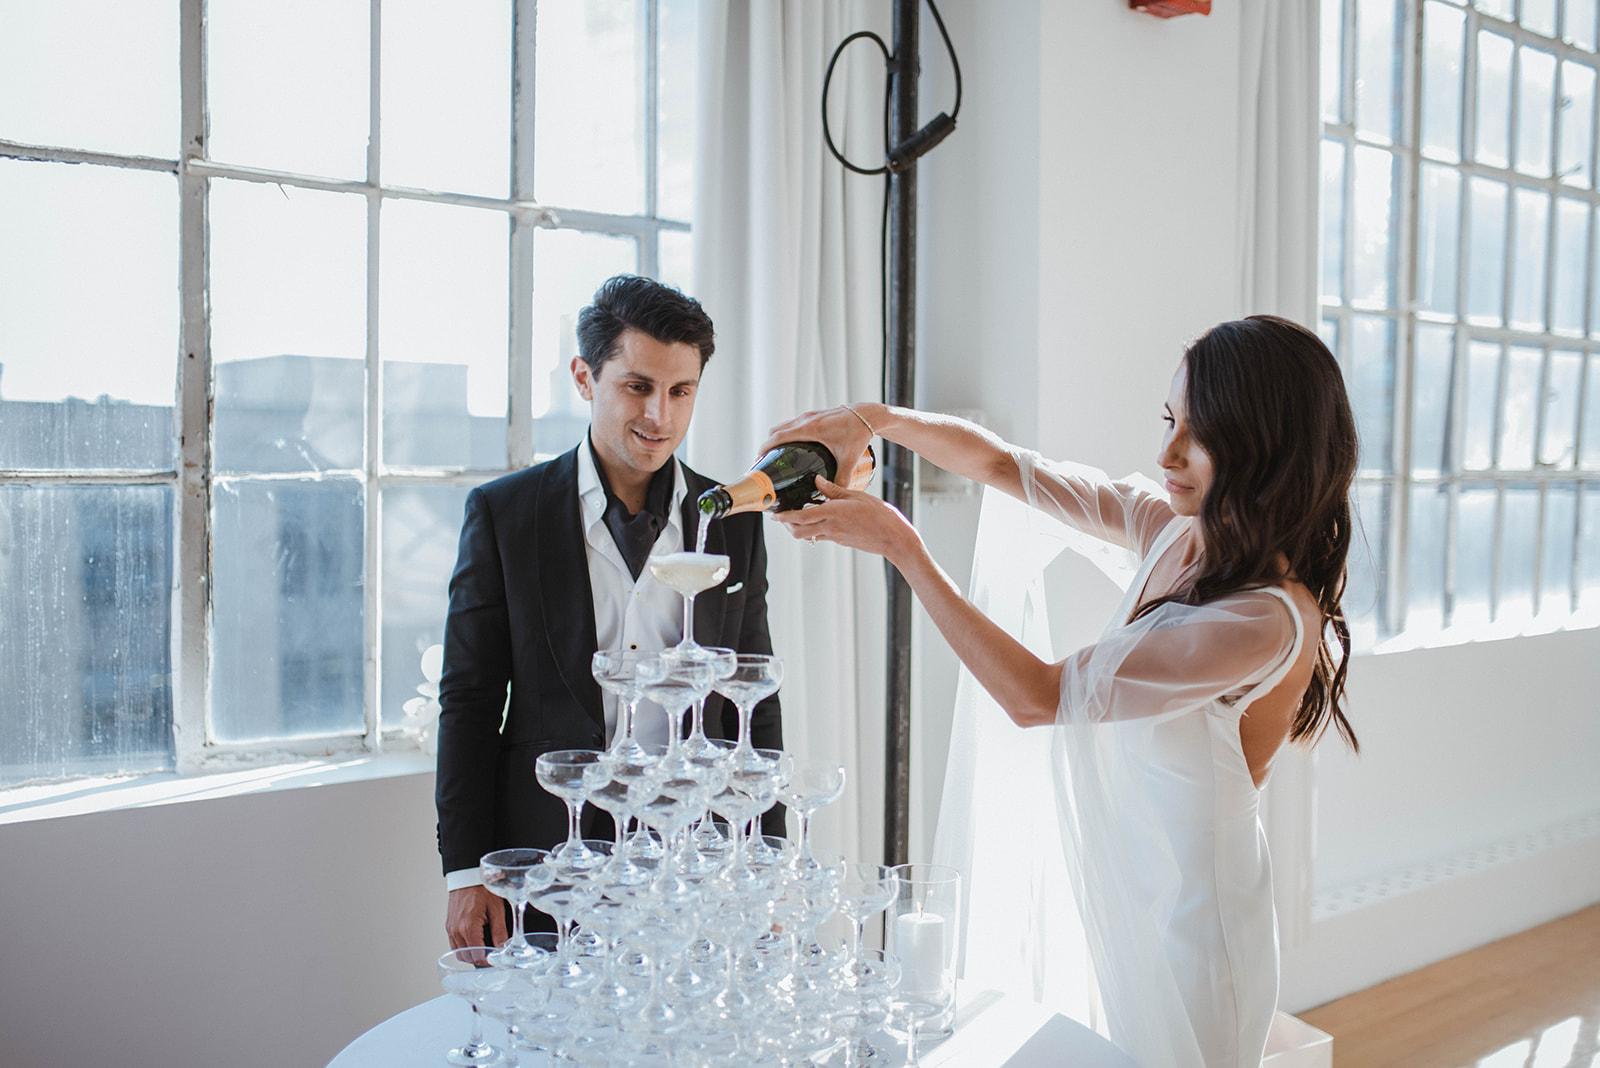 Jenna___Austin_Wedding_Day-_LHP-747.jpg